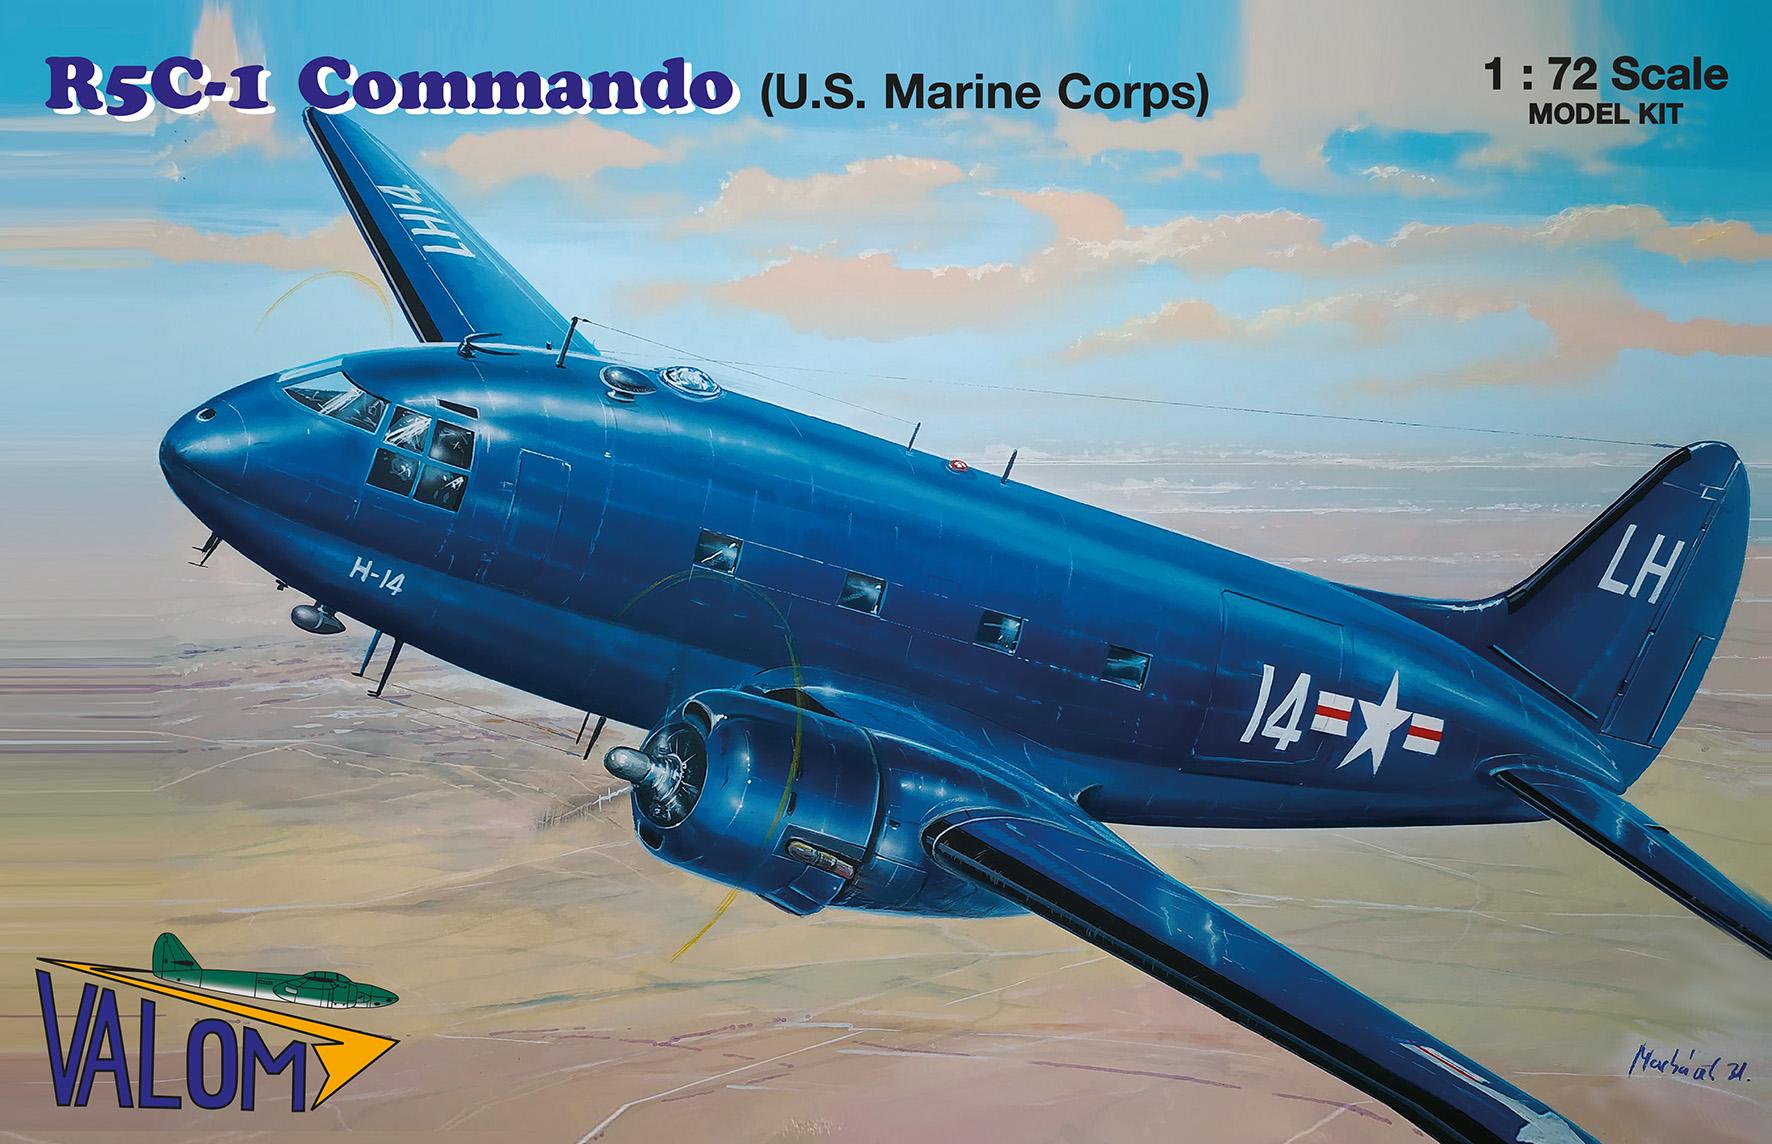 Valom 1/72 Curtiss R5C-1 Commando (U.S. Marine Corps)